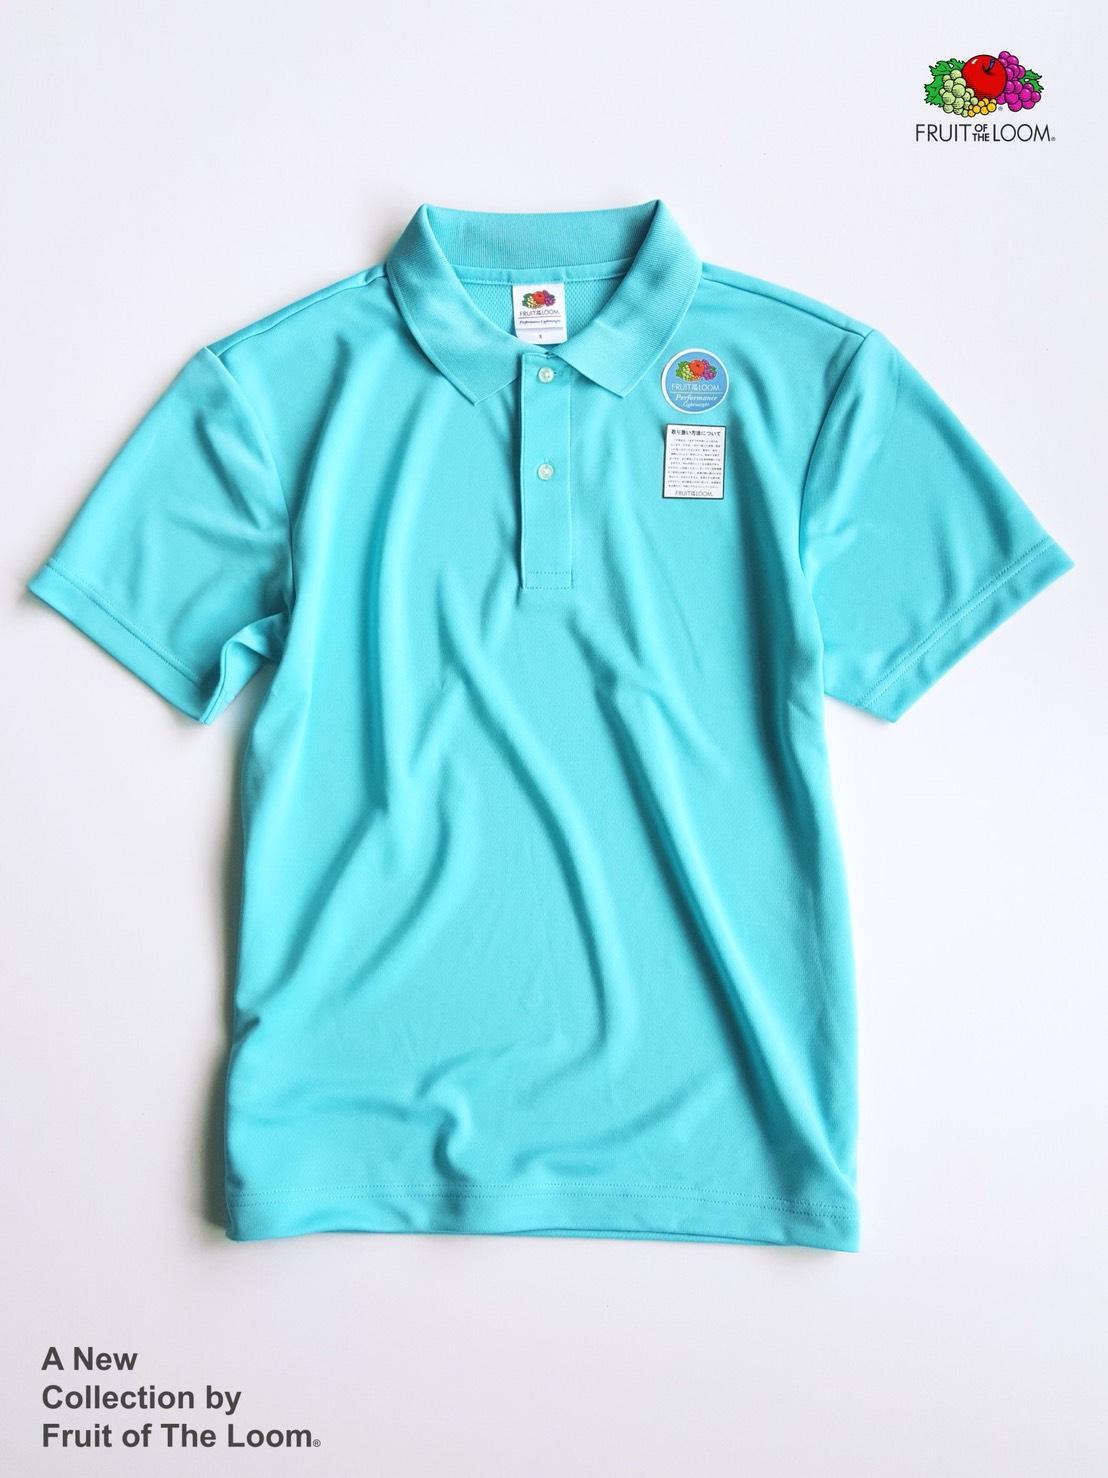 FRUIT OF THE LOOM 水果牌 - DYP9000 吸濕排汗 4.1OZ 短袖 POLO衫 (AB水藍)